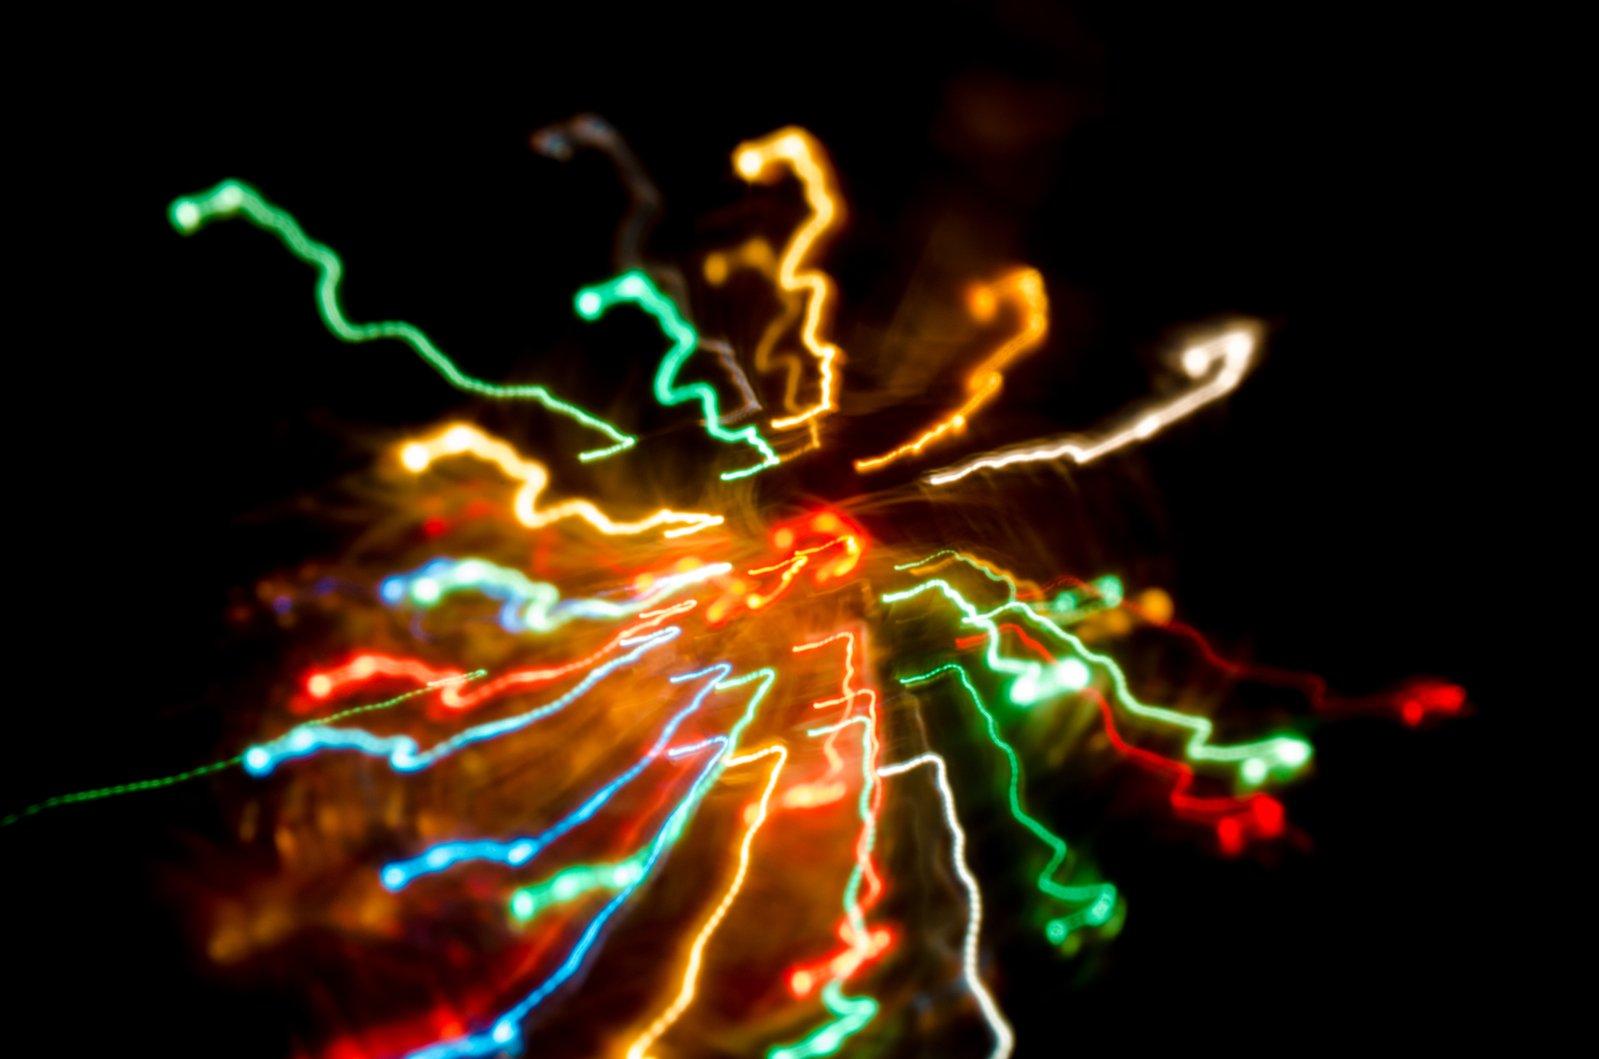 Free Bokeh zoom blur Stock Photo - FreeImages.com